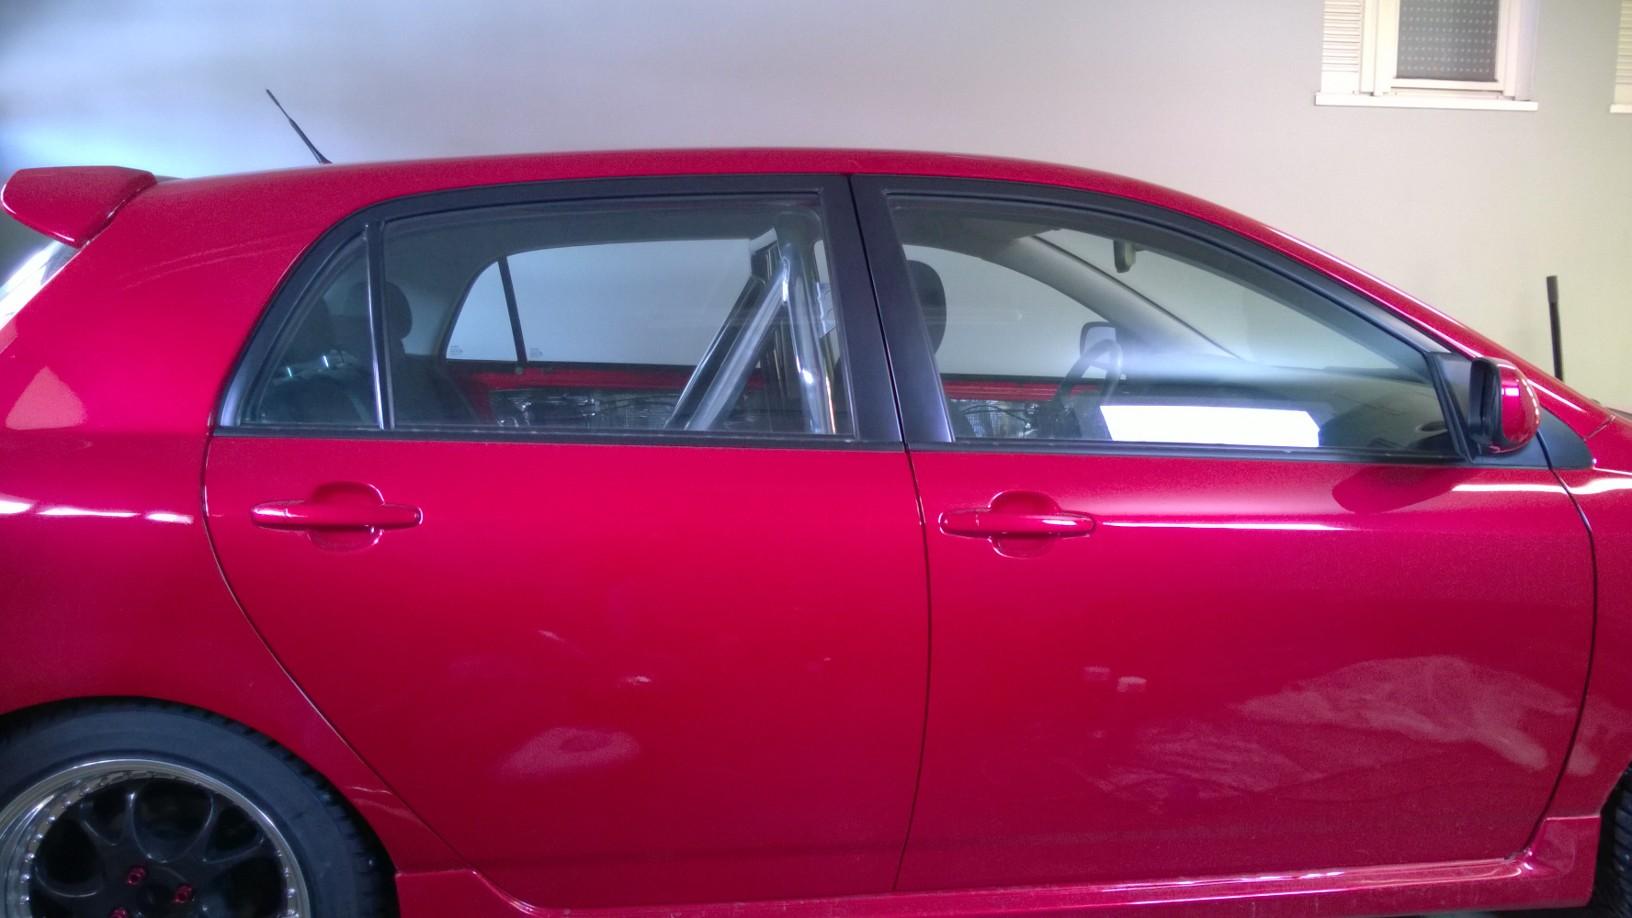 Japtoys & Fittest presents: Mysticin Toyota Corolla E12 Omb7